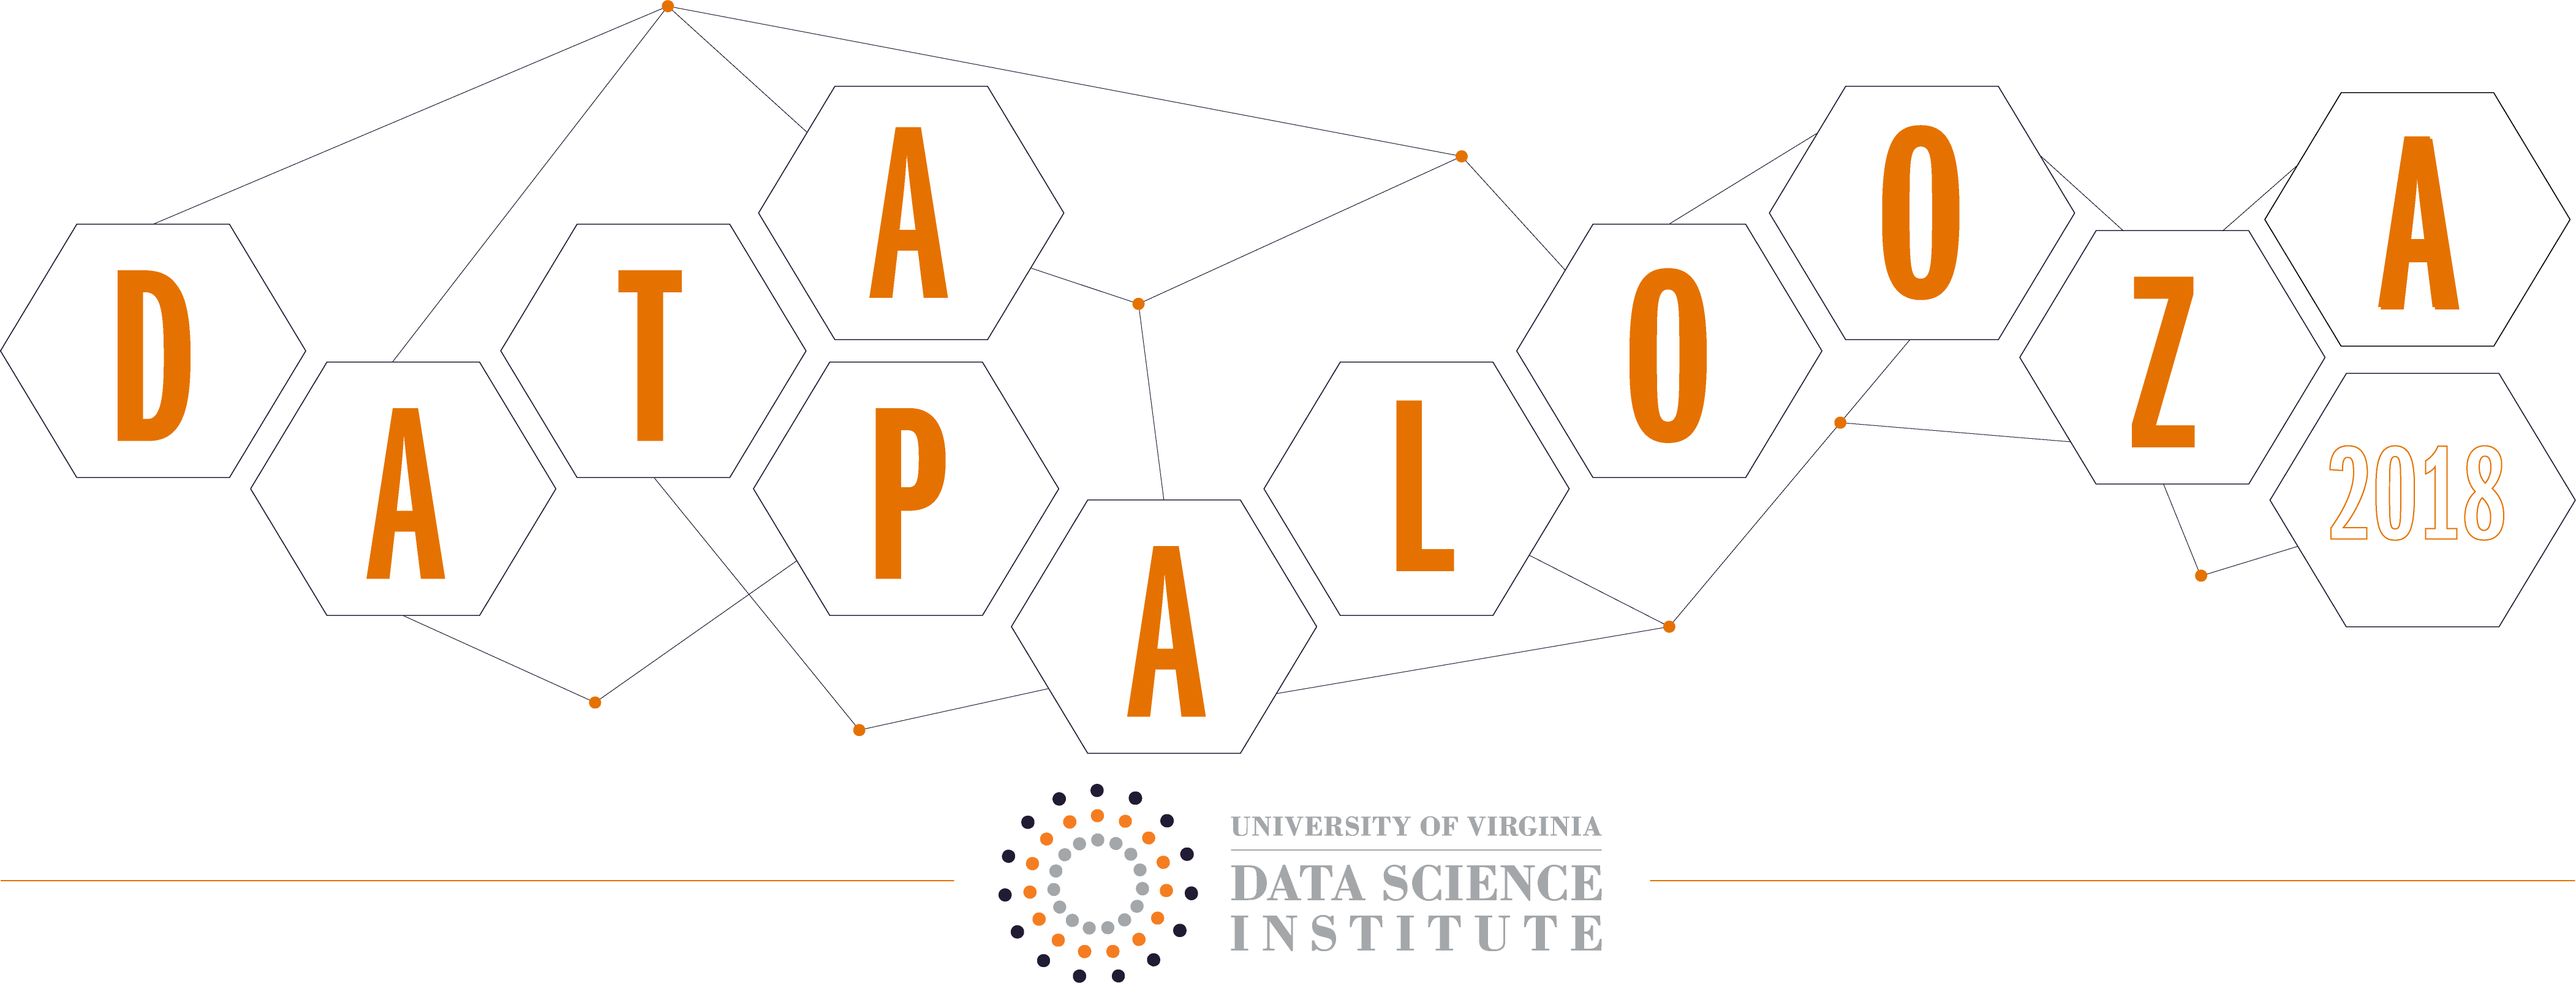 Datapalooza 2018